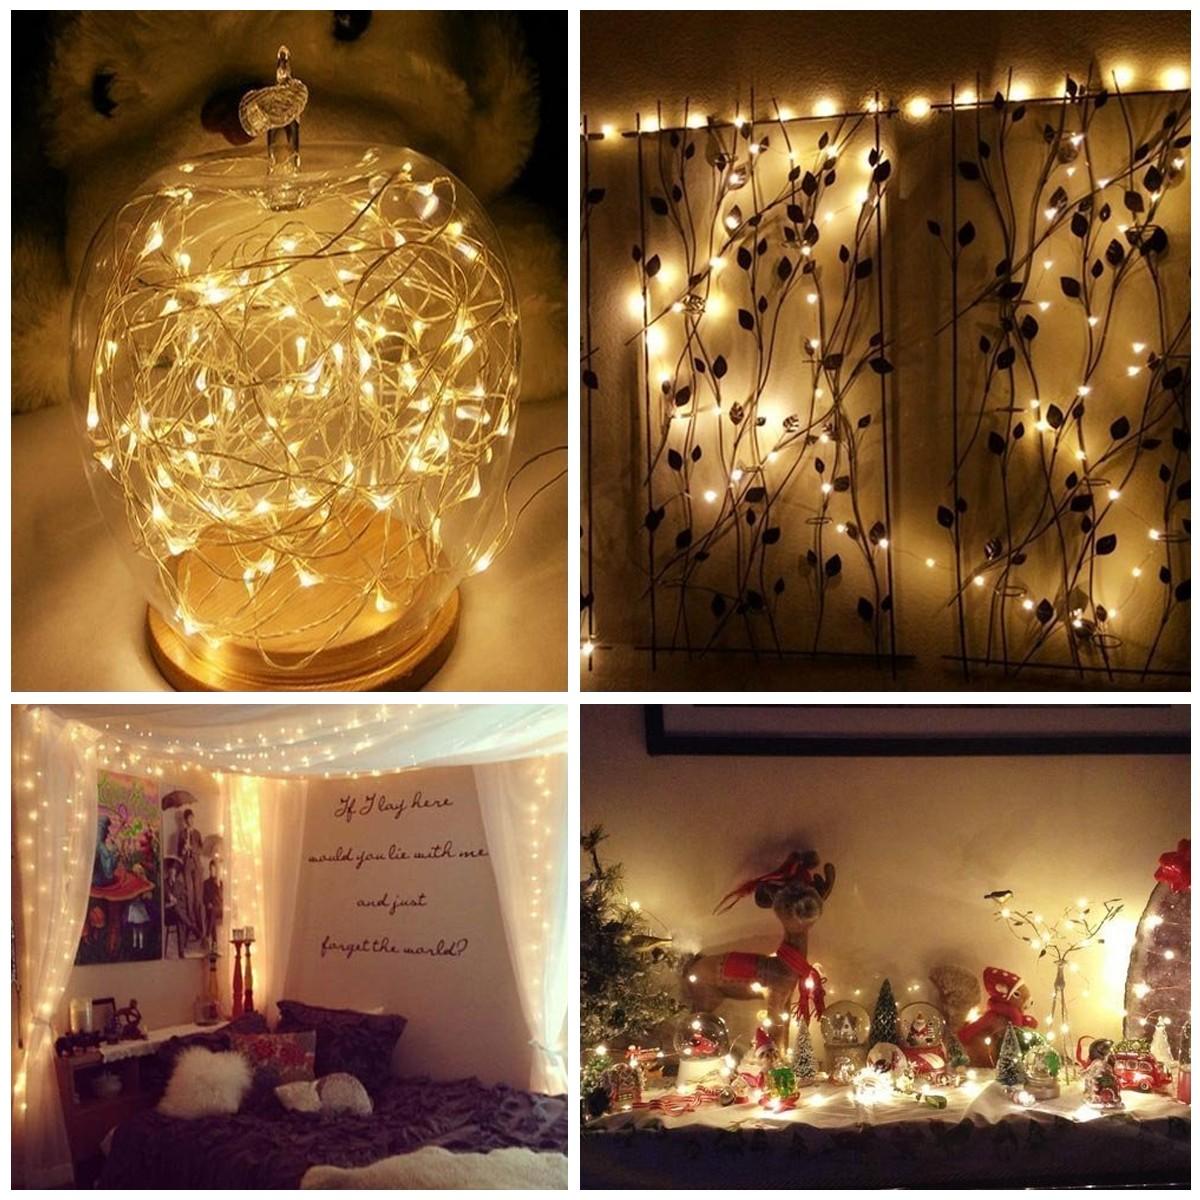 Luces led calidas rbol decorativo de cm con nieve luces - Luces led calidas ...